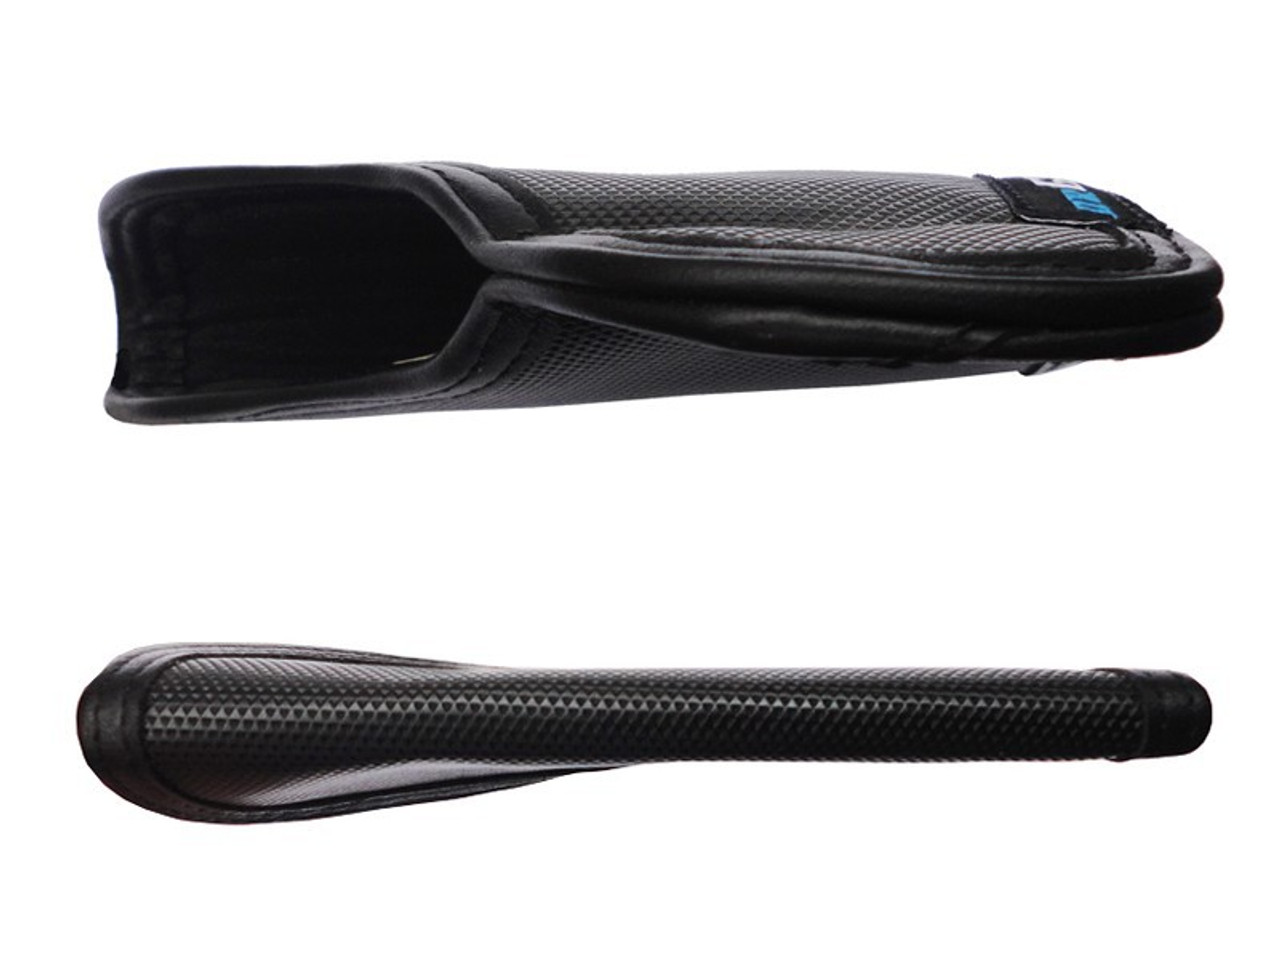 Ruger LCP 380 w / Crimson Trace LG-431 Laserguard Ambidextrous orGUNizer Pocket Holster by Garrison Grip (C )